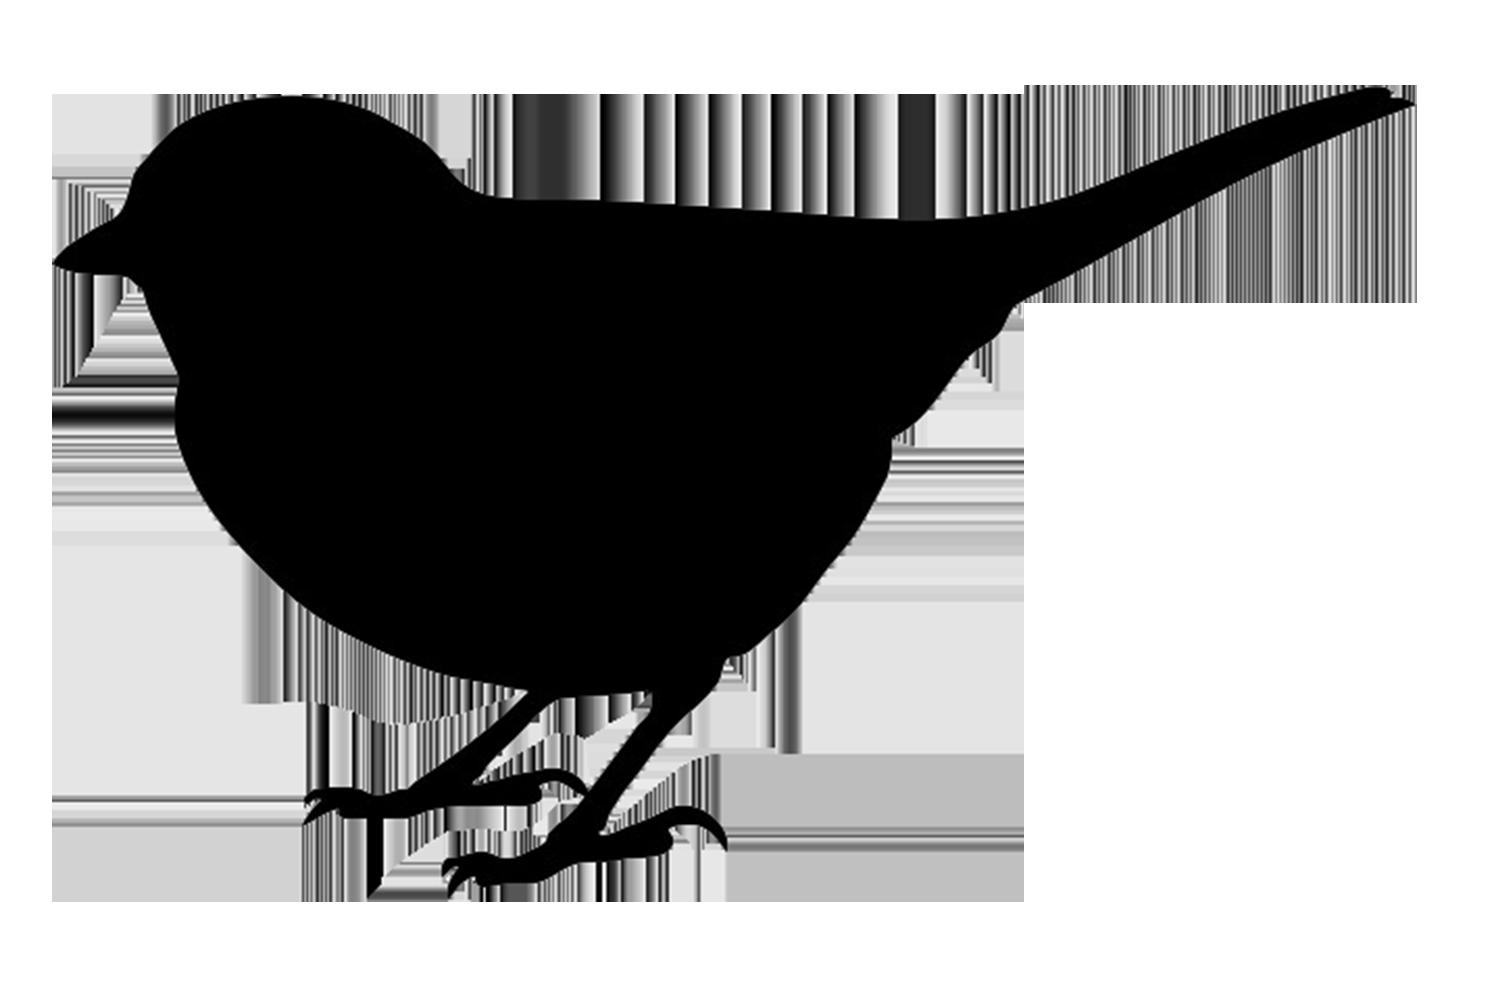 Massif image with regard to bird silhouette printable